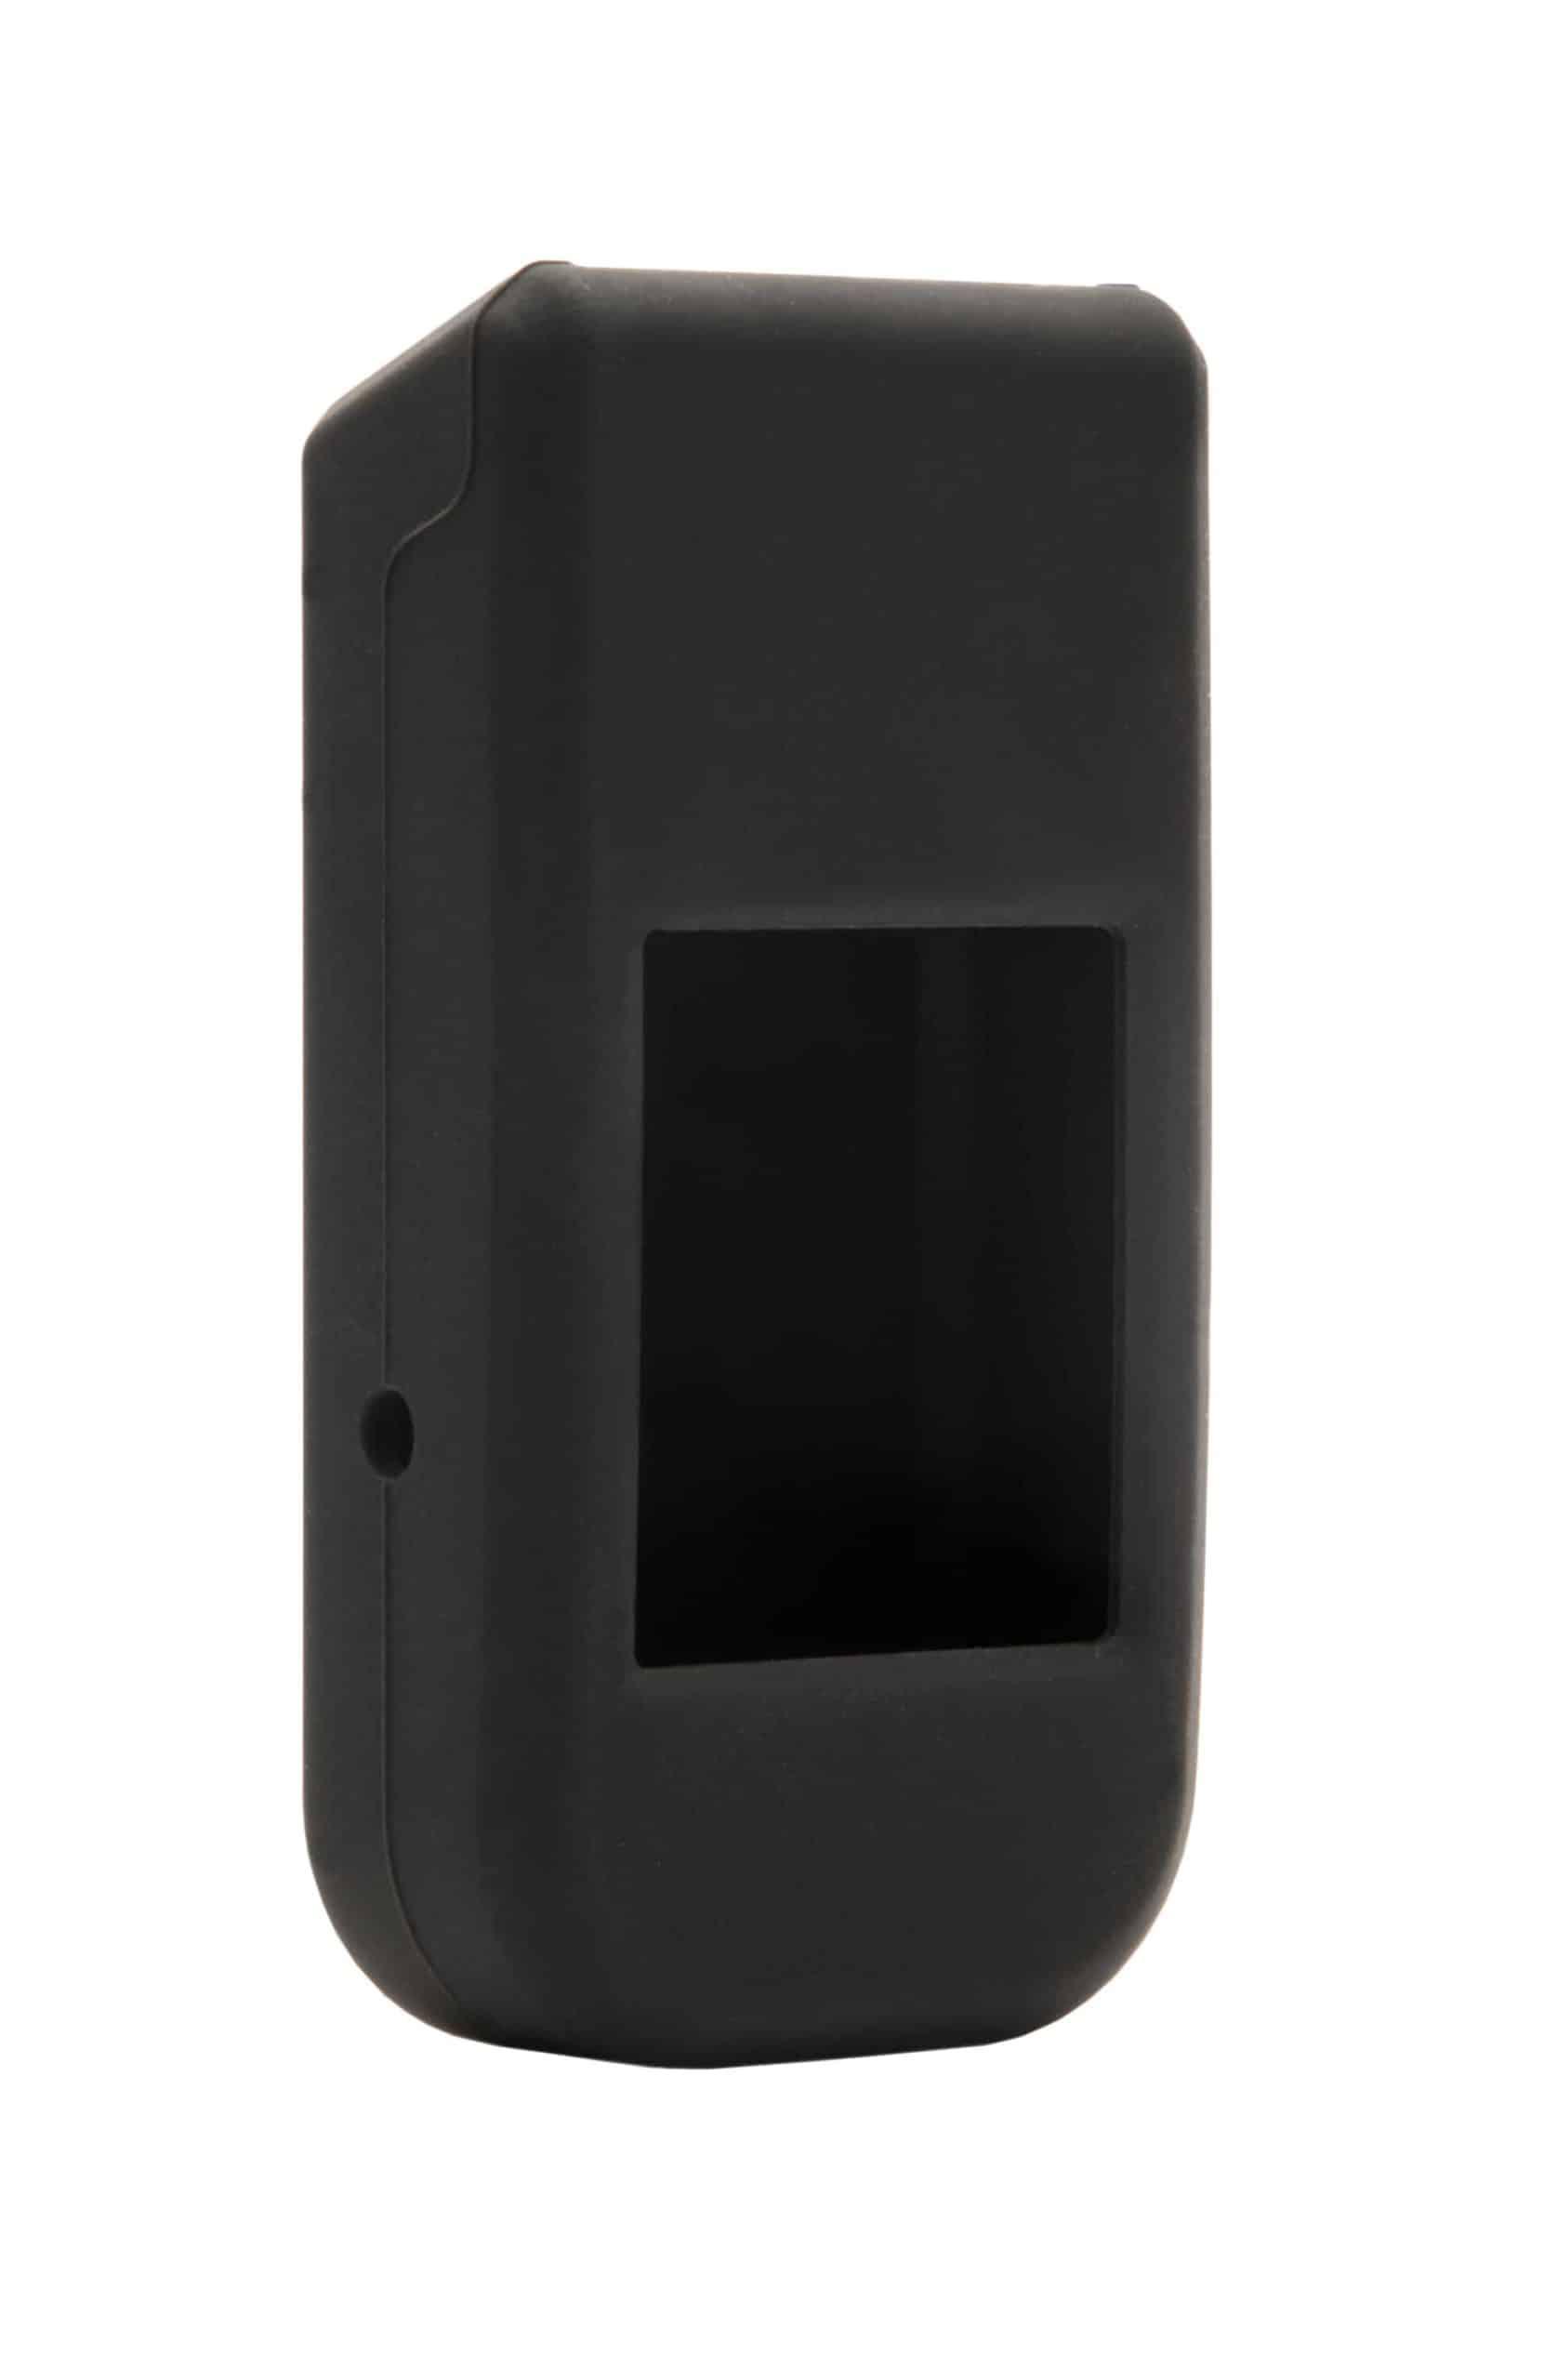 Opticon Silicon Cover for PX-20